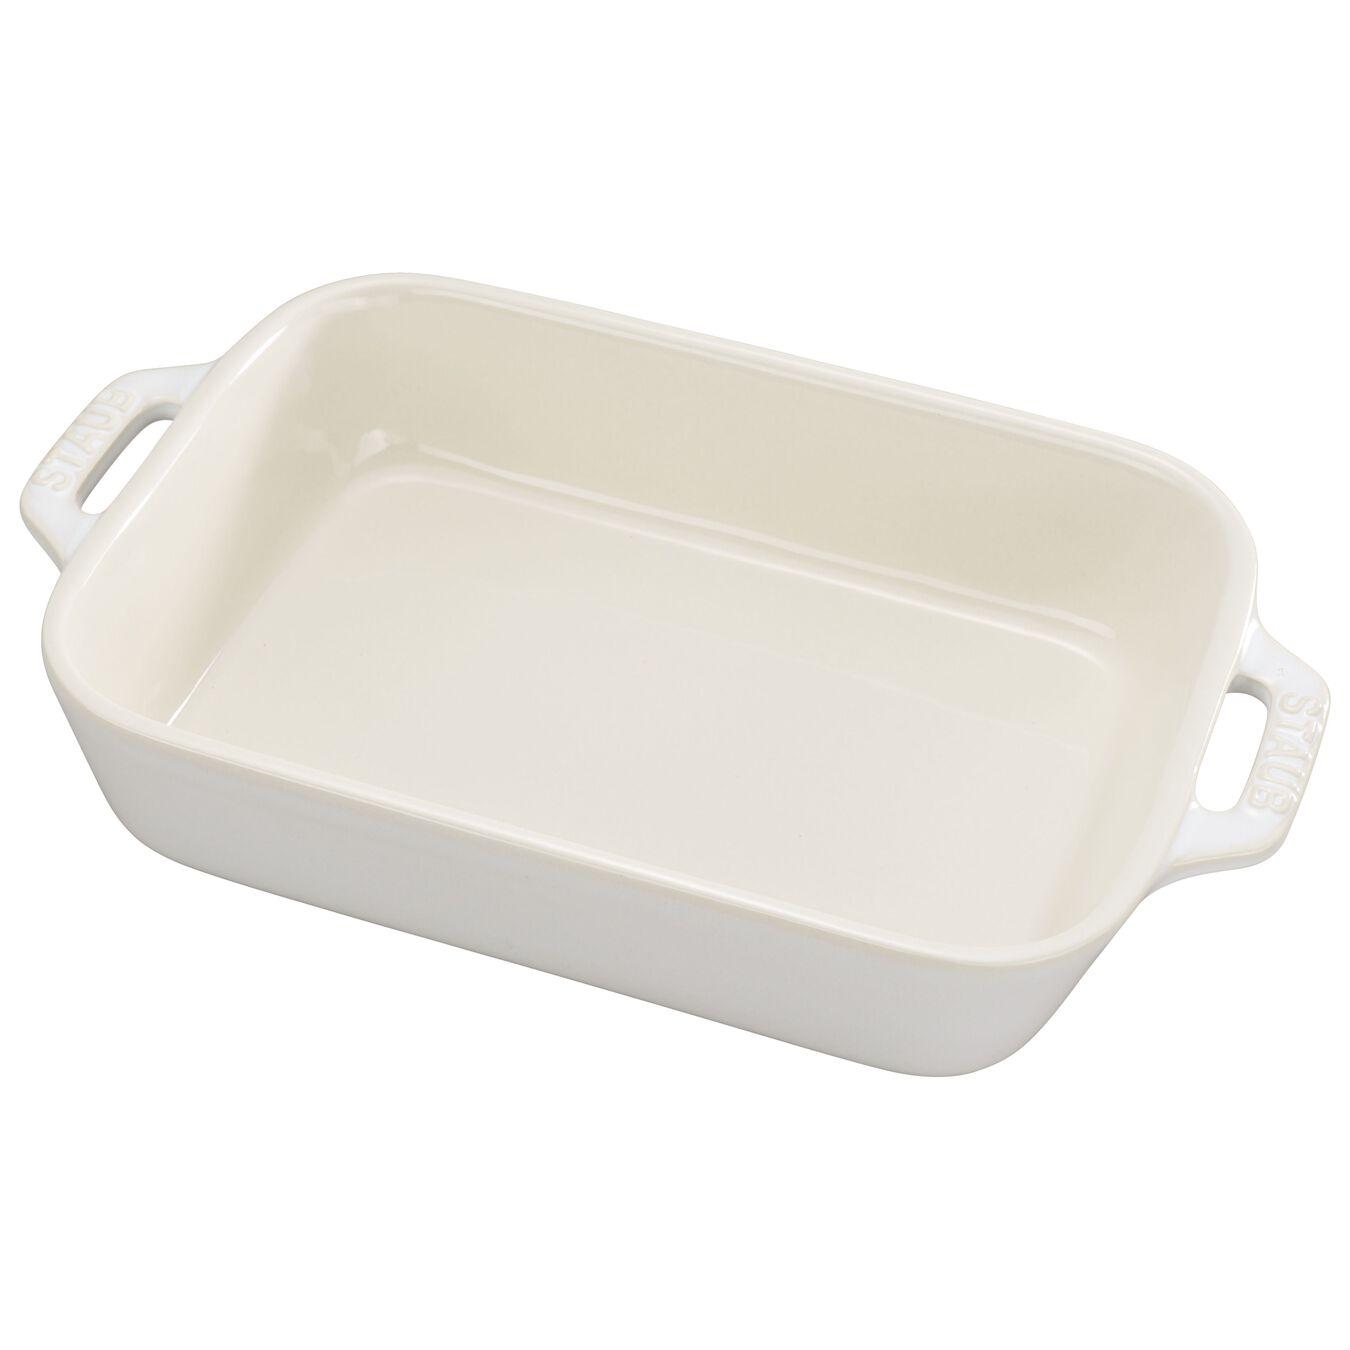 6.3 x 8-inch, rectangular, Oven dish, ivory-white,,large 1